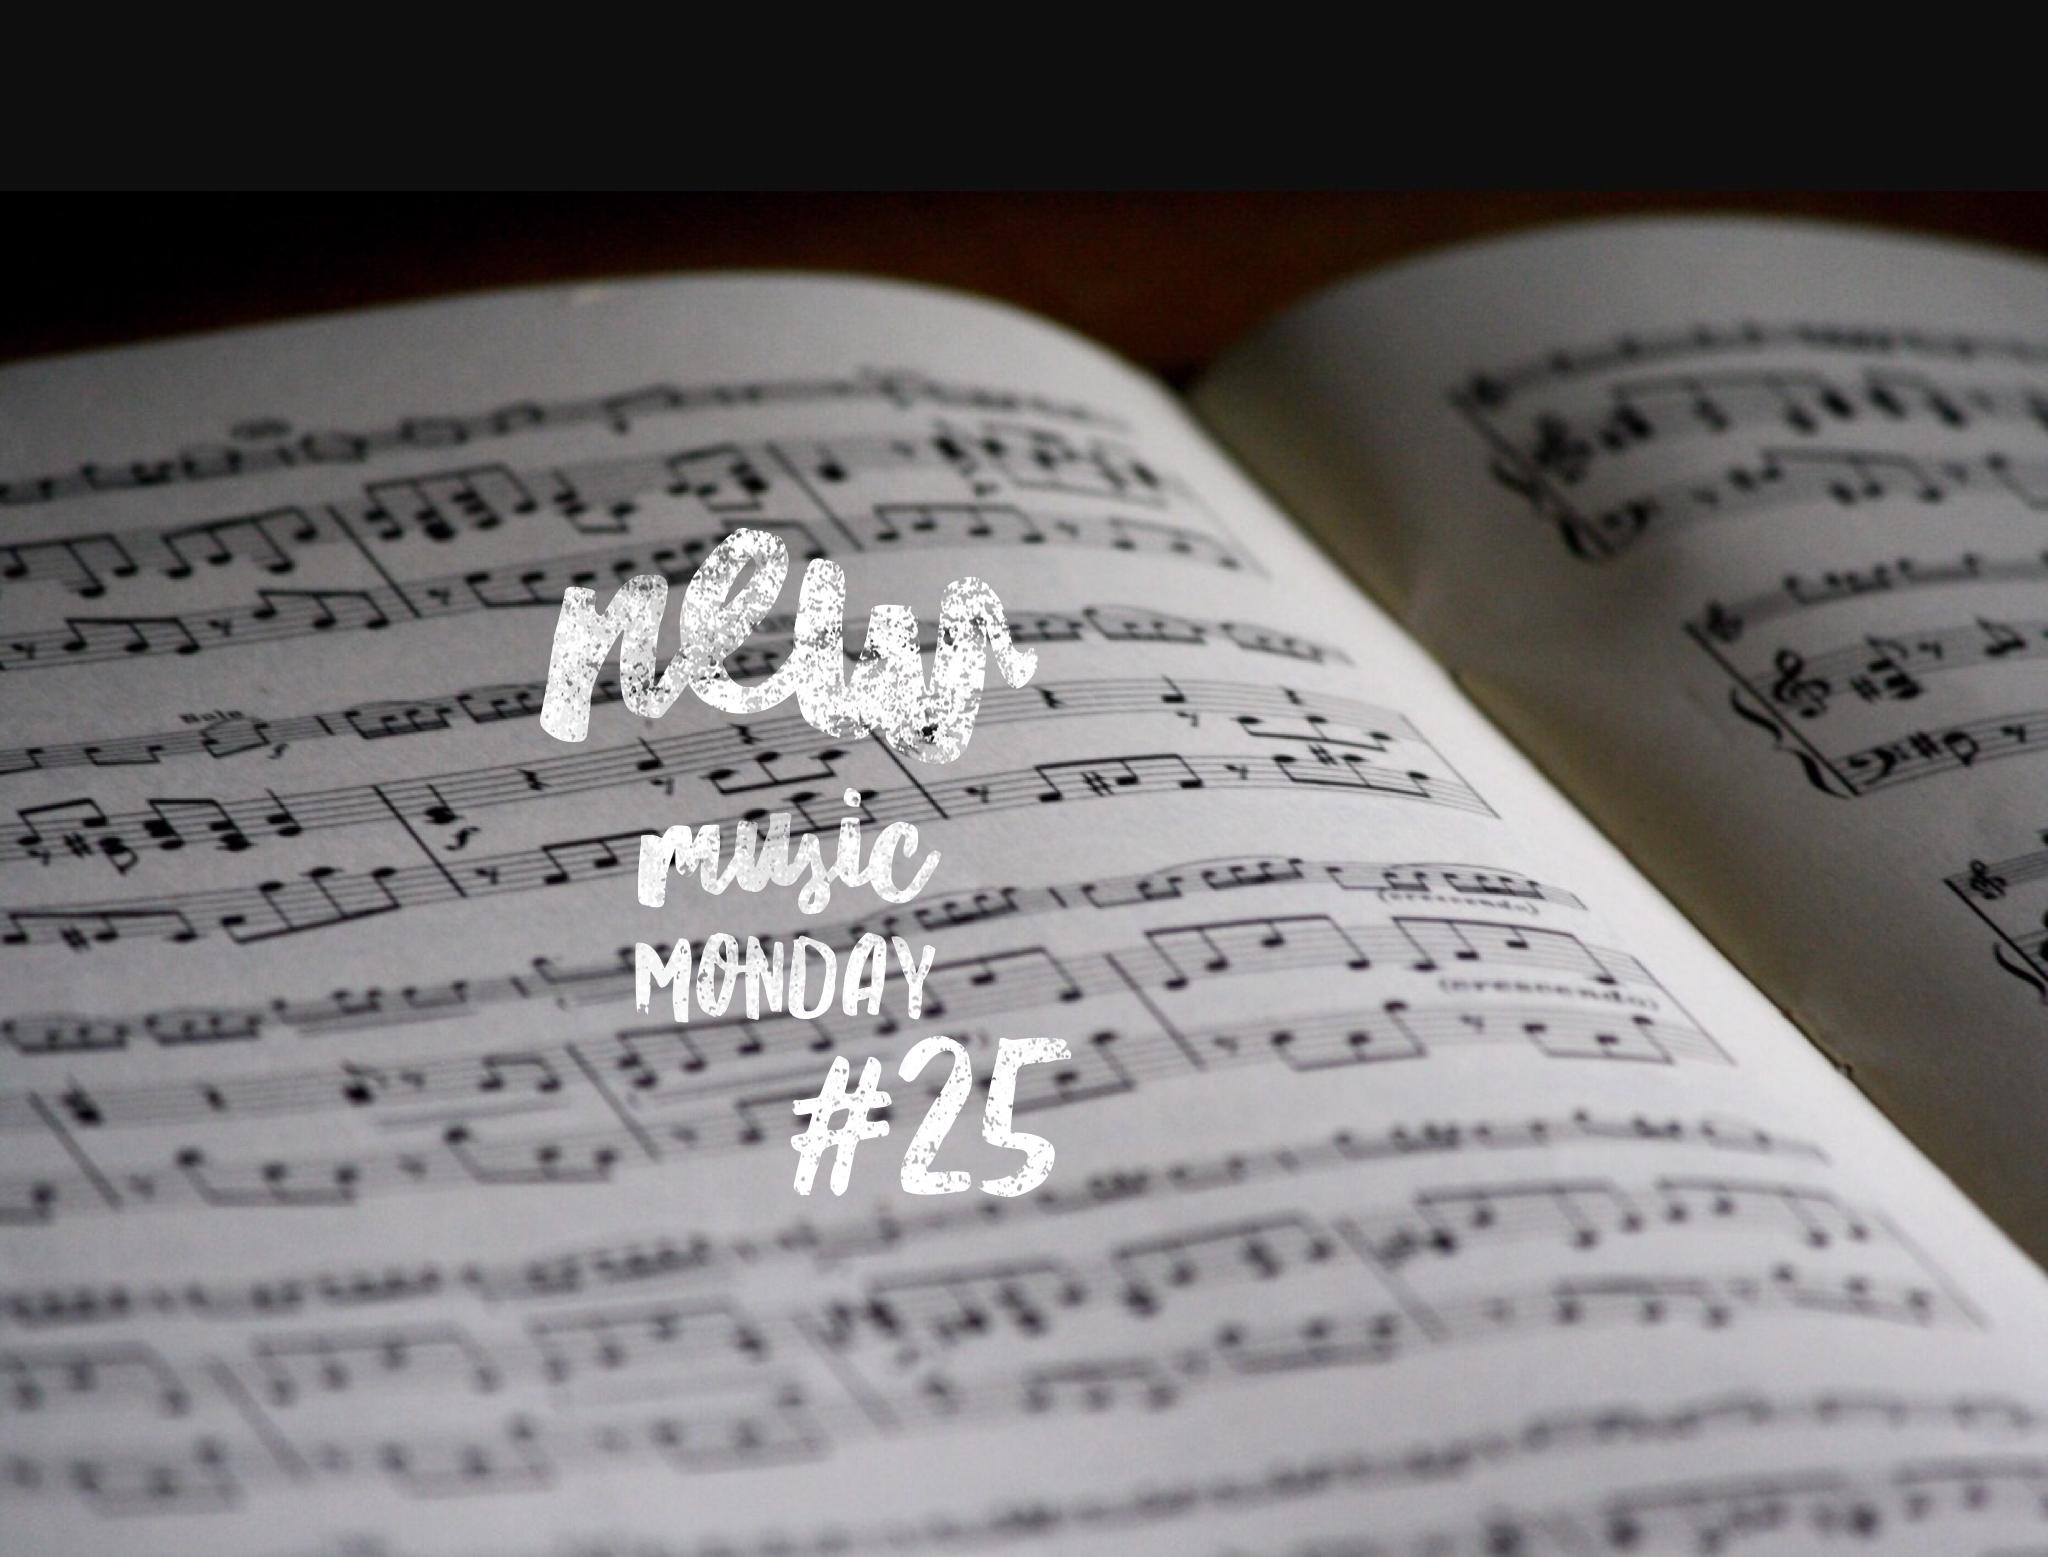 New Music Monday #25